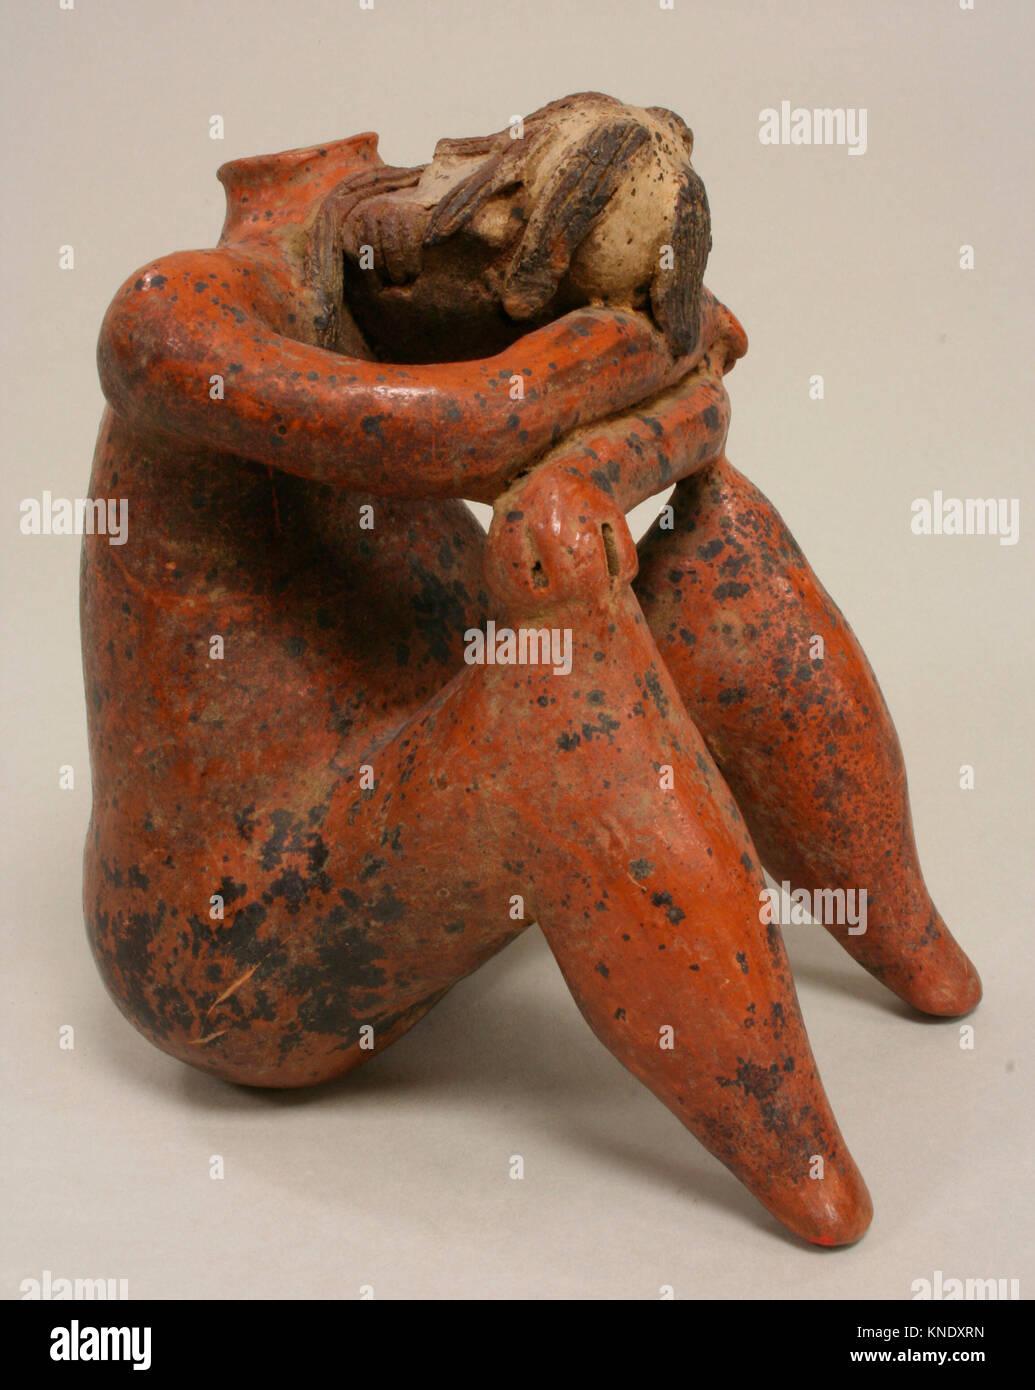 Trauer Abbildung Schiff. Datum: 2.Jahrhundert v. Chr. - A.D. 2.Jahrhundert; Geographie: Mexiko, Mesoamerika, Nayarit; Stockbild